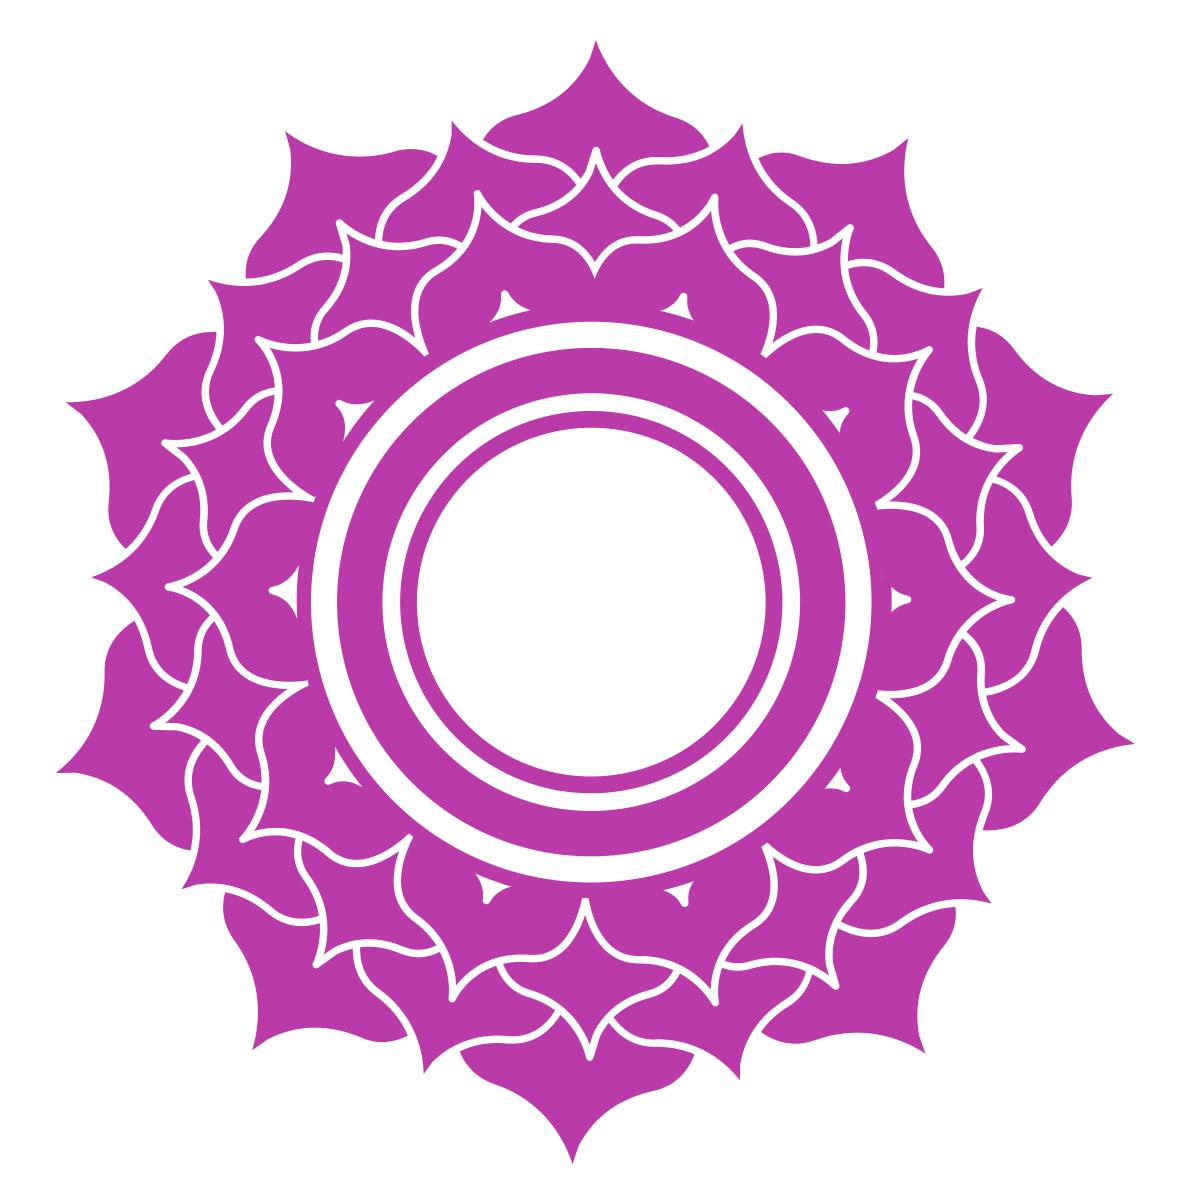 crown chakra symbol - all about chakras